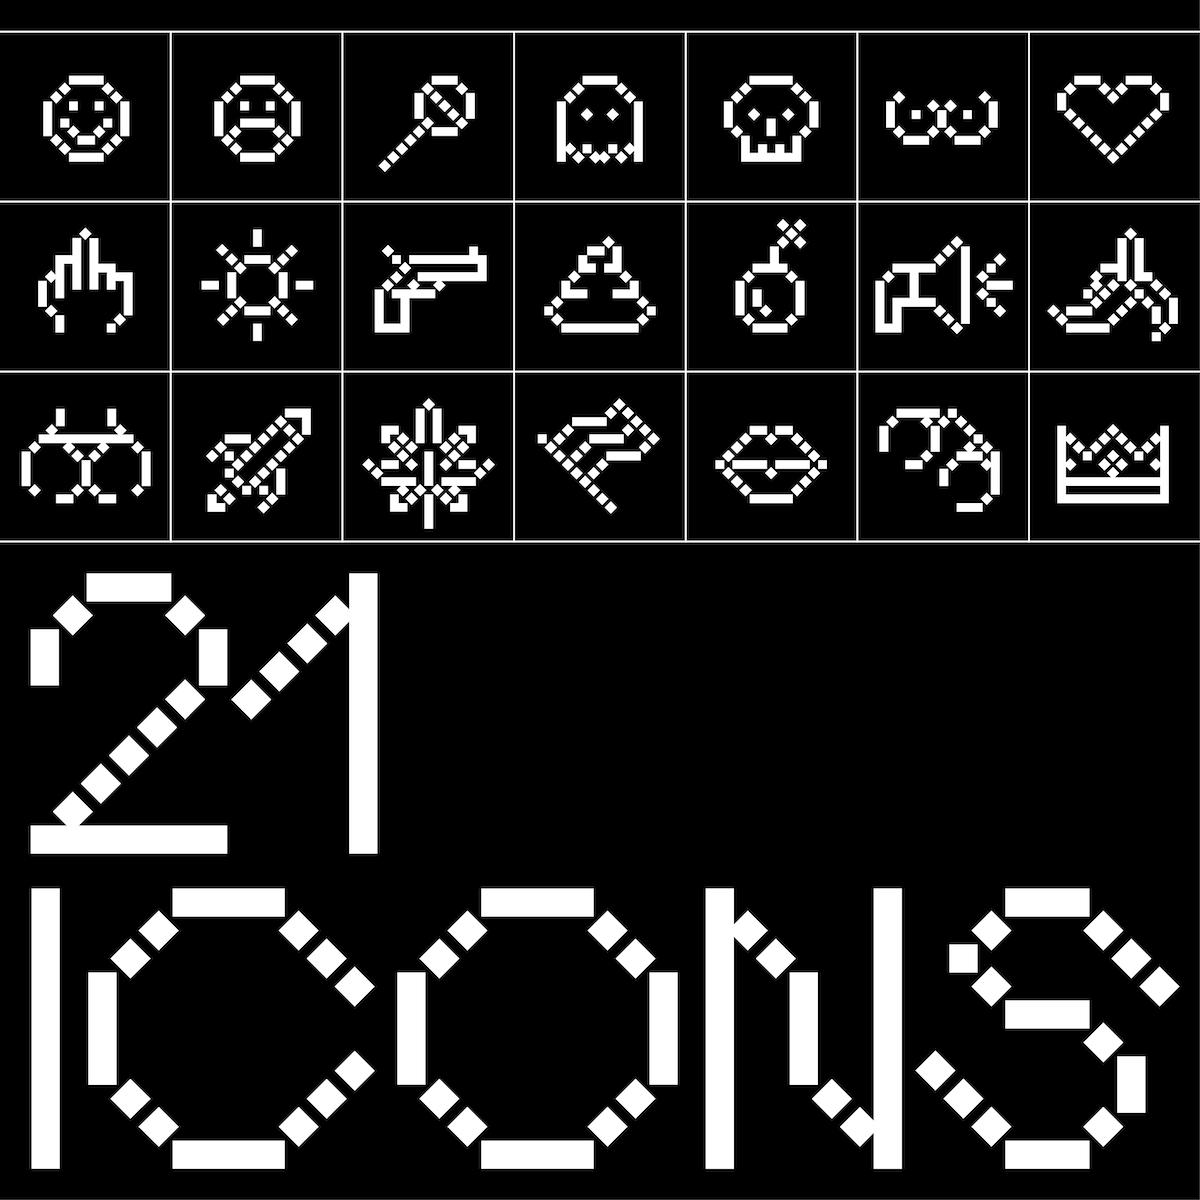 Analo Grotesk pixel font icons